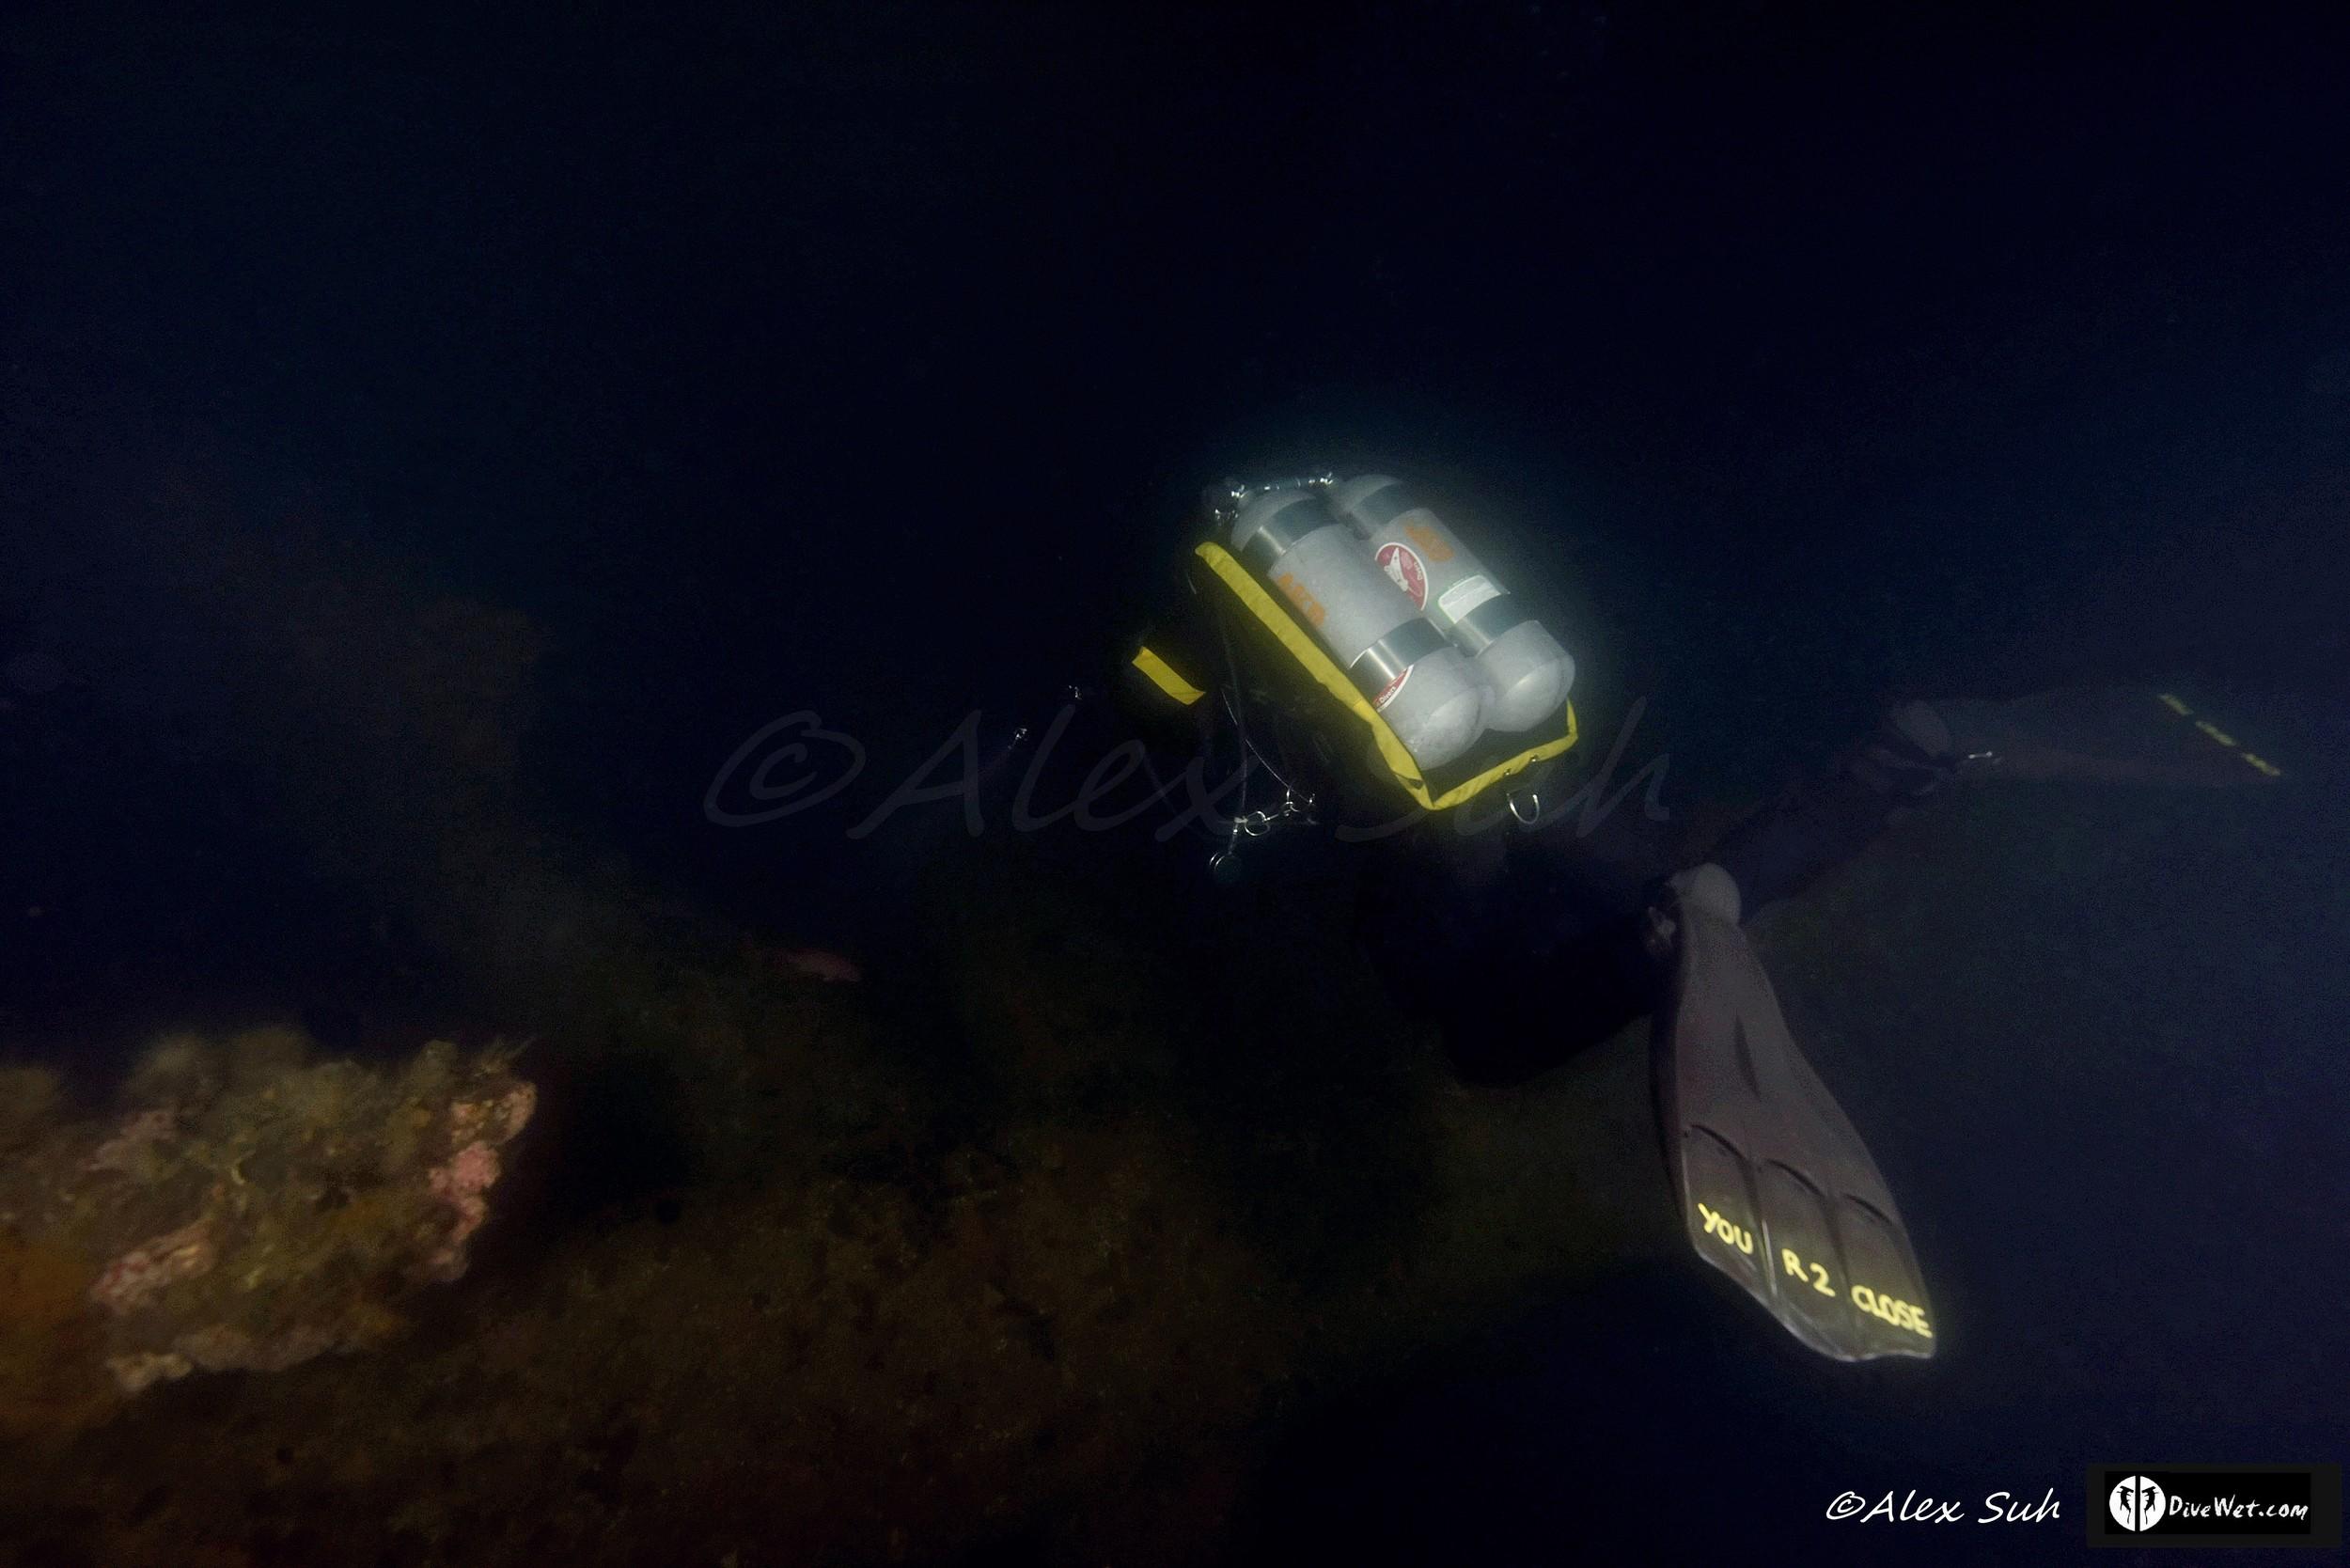 Double Tank Tech Diver Under Oil Rig